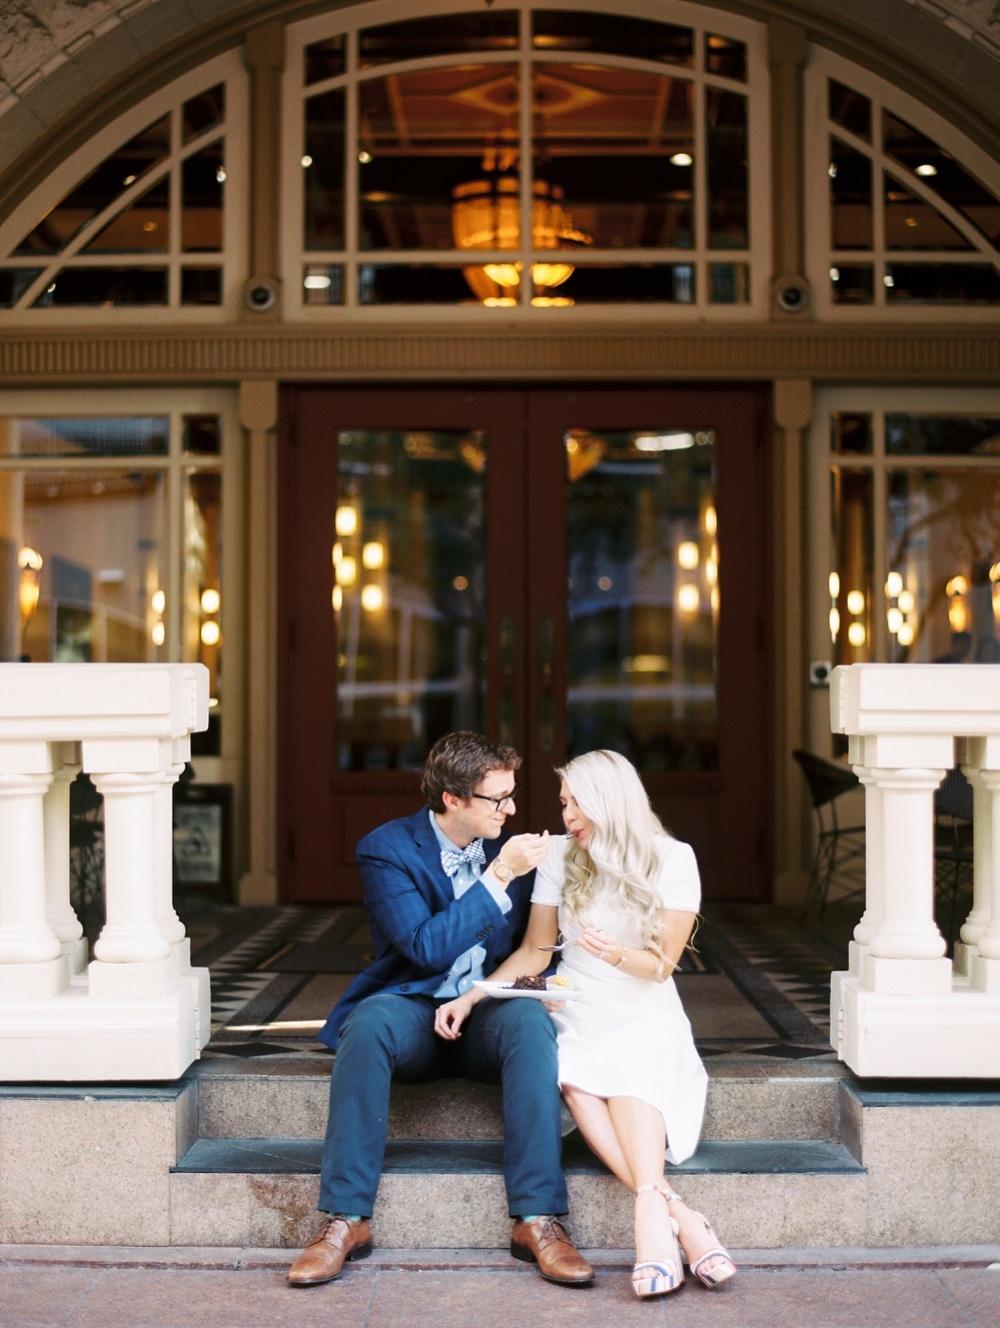 kristin-la-voie-photography-austin-wedding-photographer-the-driskill-5